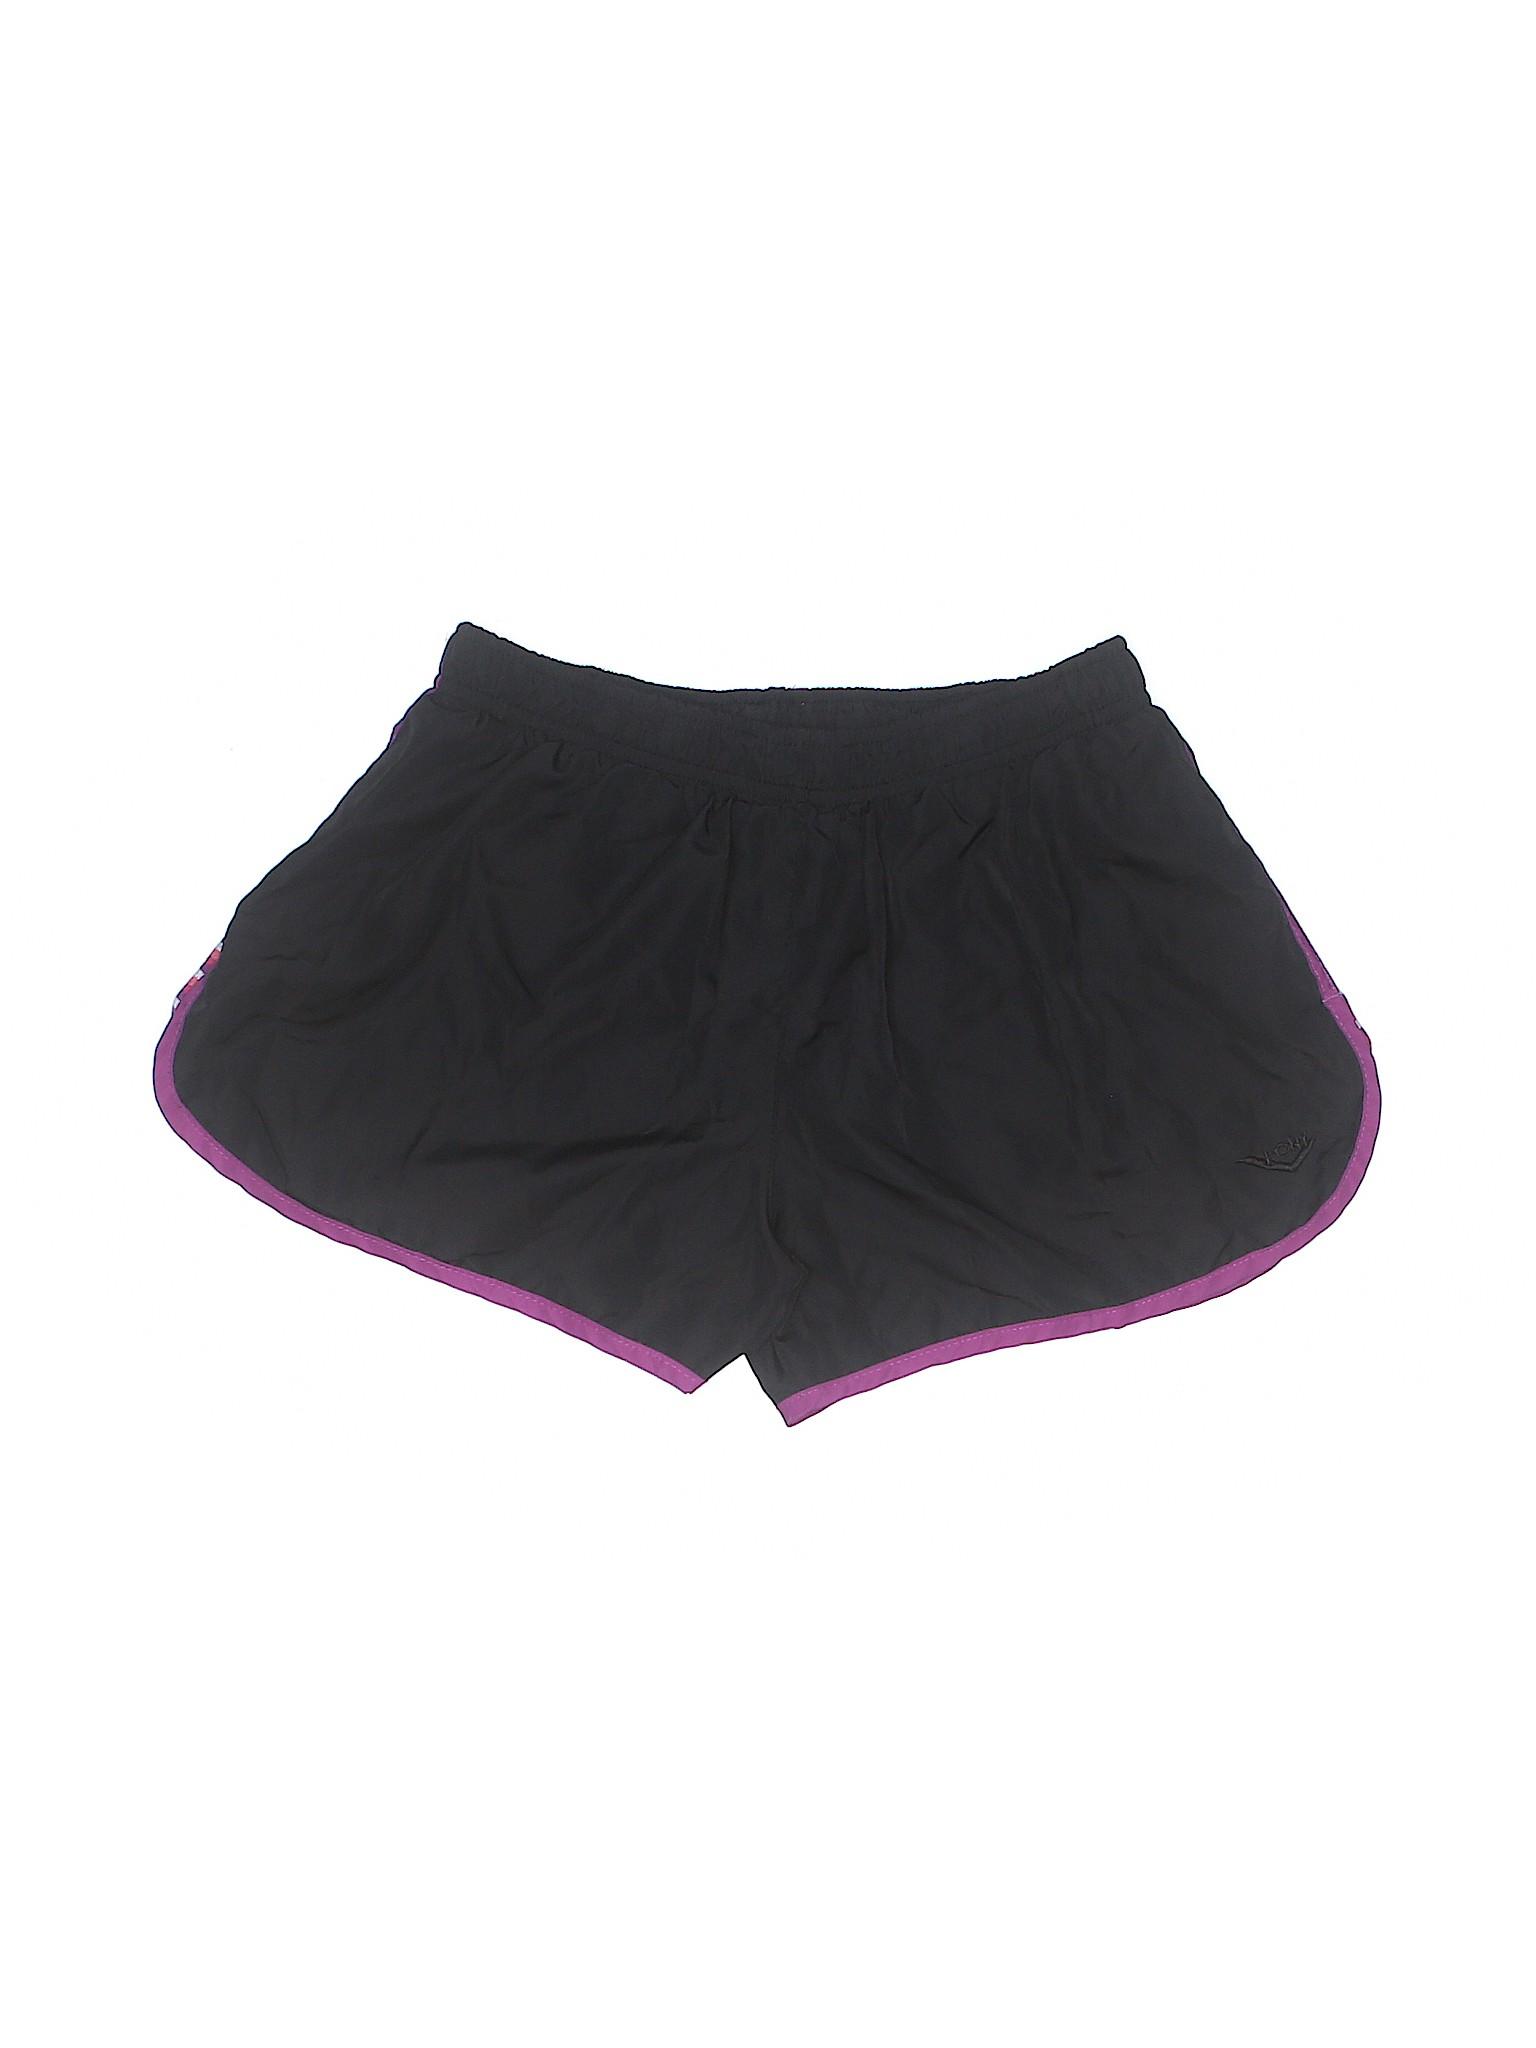 Boutique Pony Boutique Pony Athletic Pony Athletic Athletic Shorts Shorts Shorts Boutique 4q8TRx